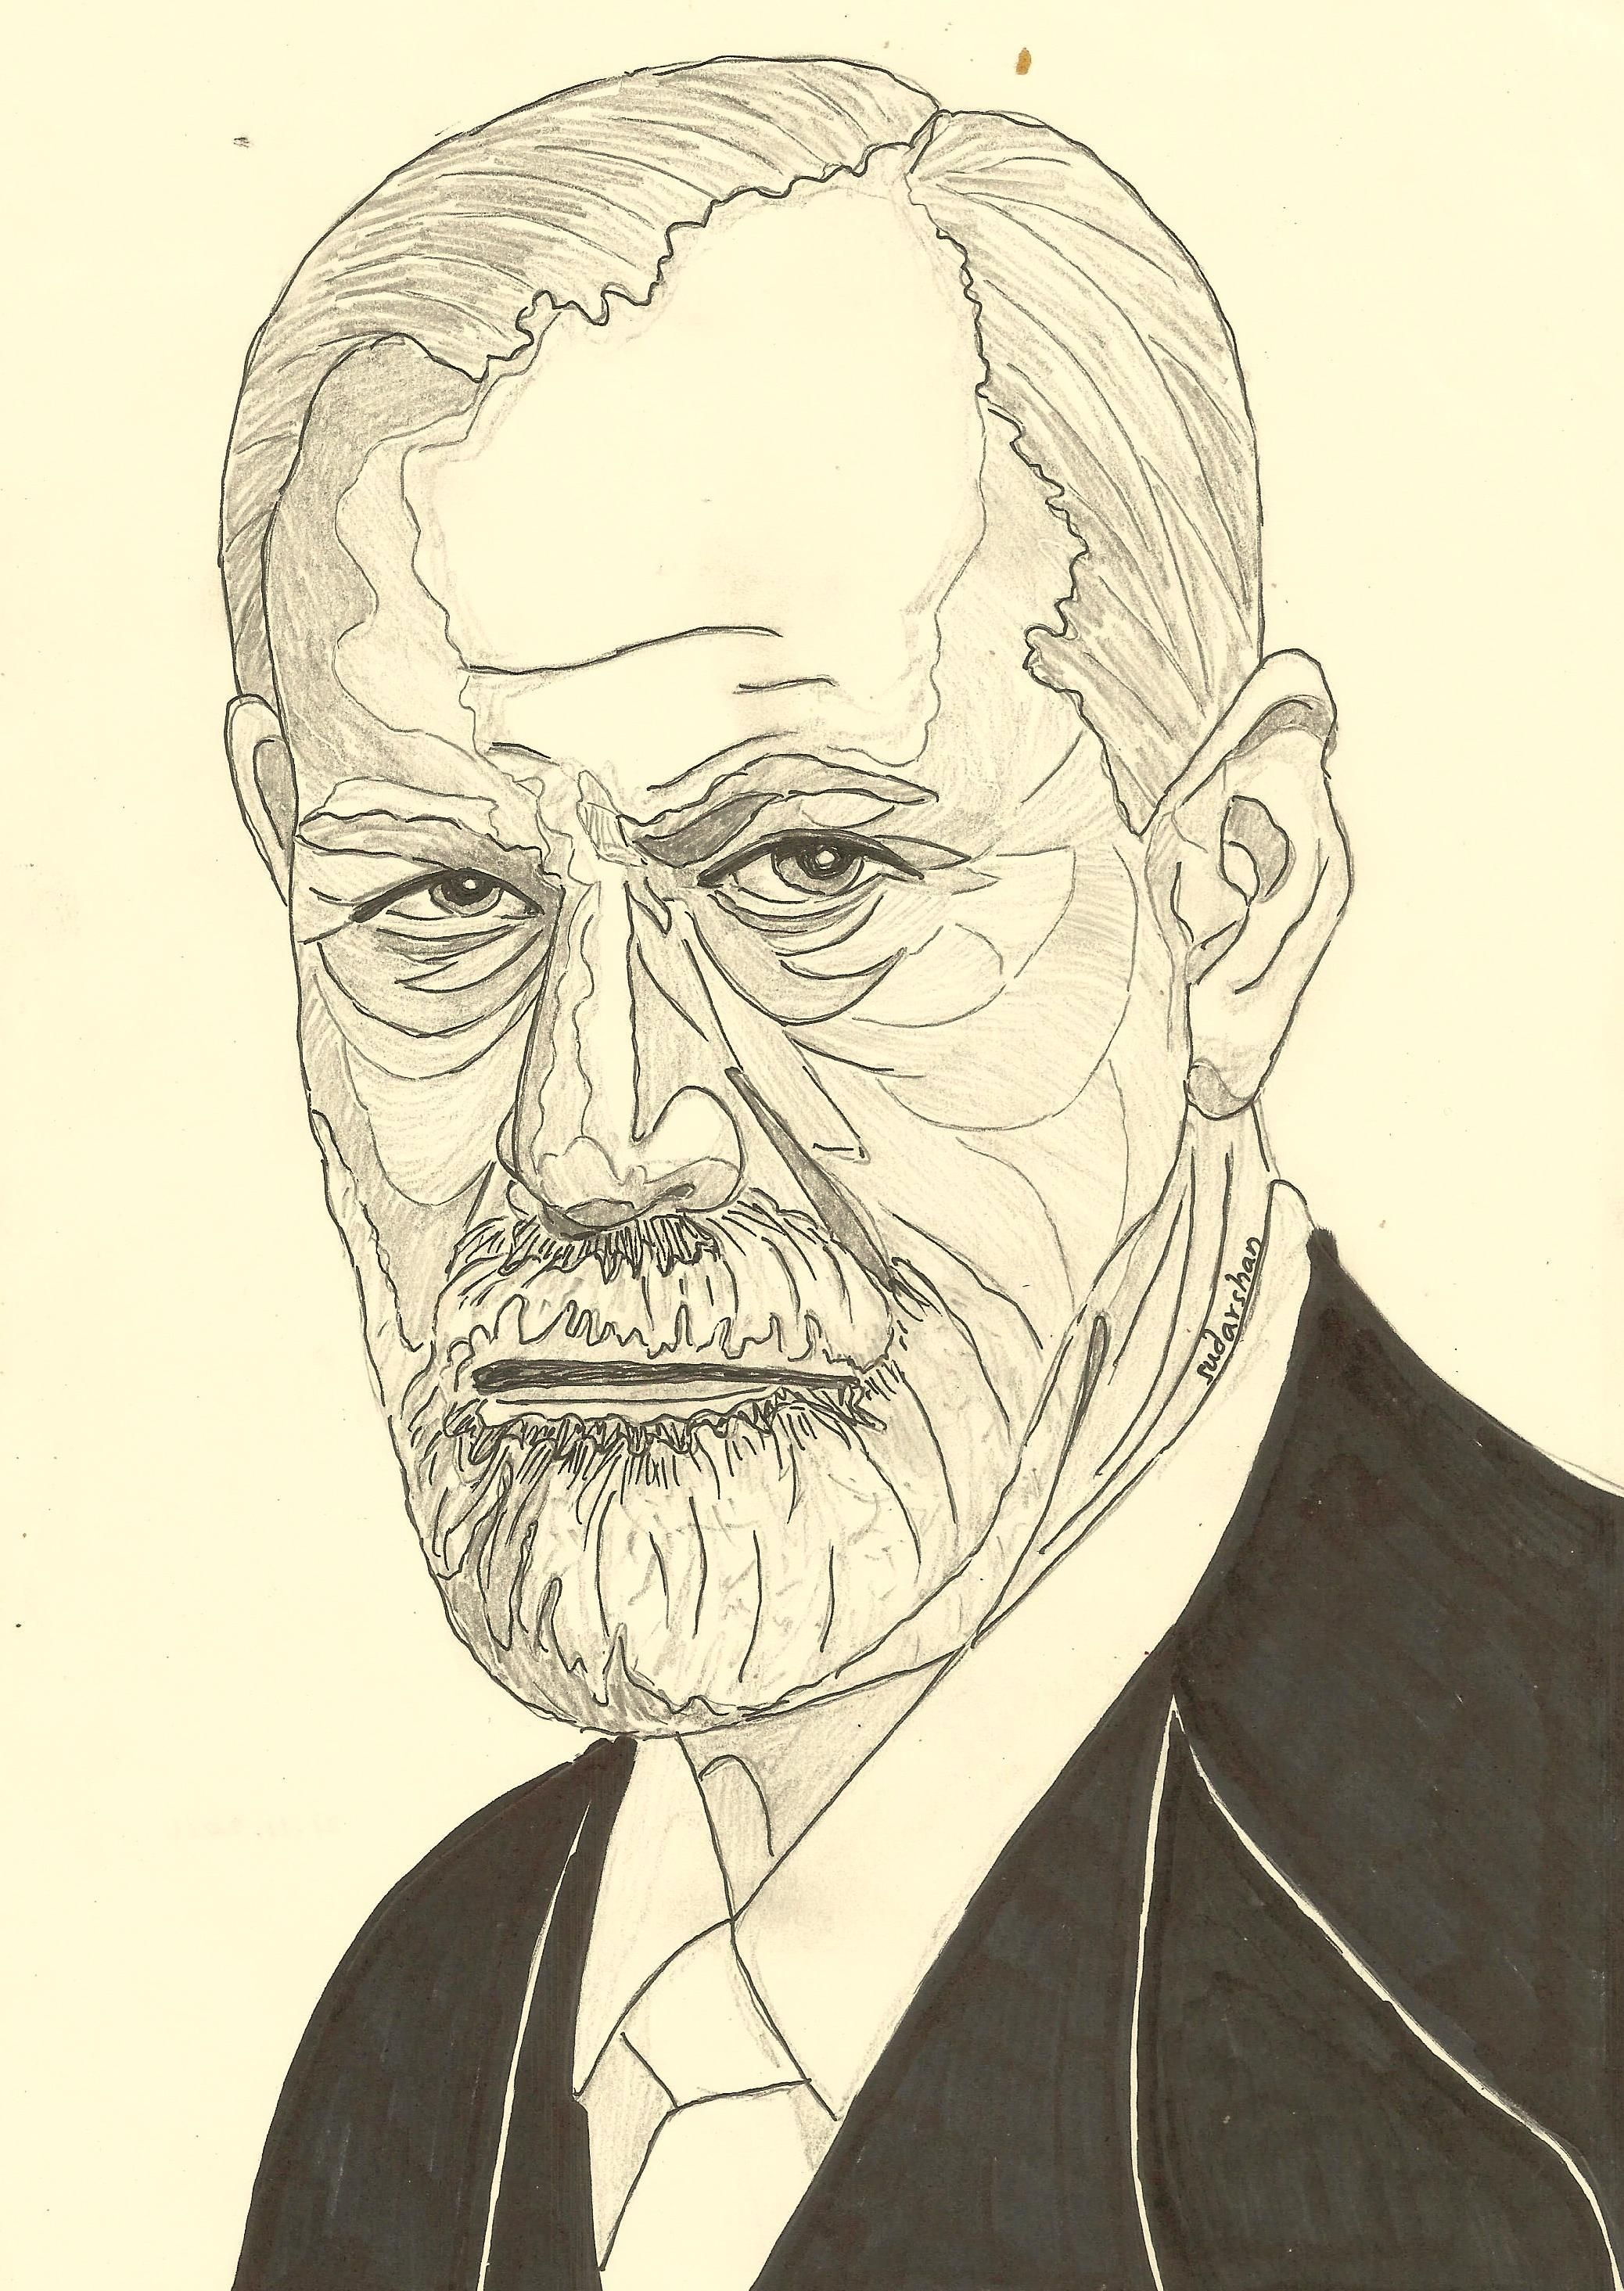 SIGMUND FREUD | Person sketch, Sketches, Caricature